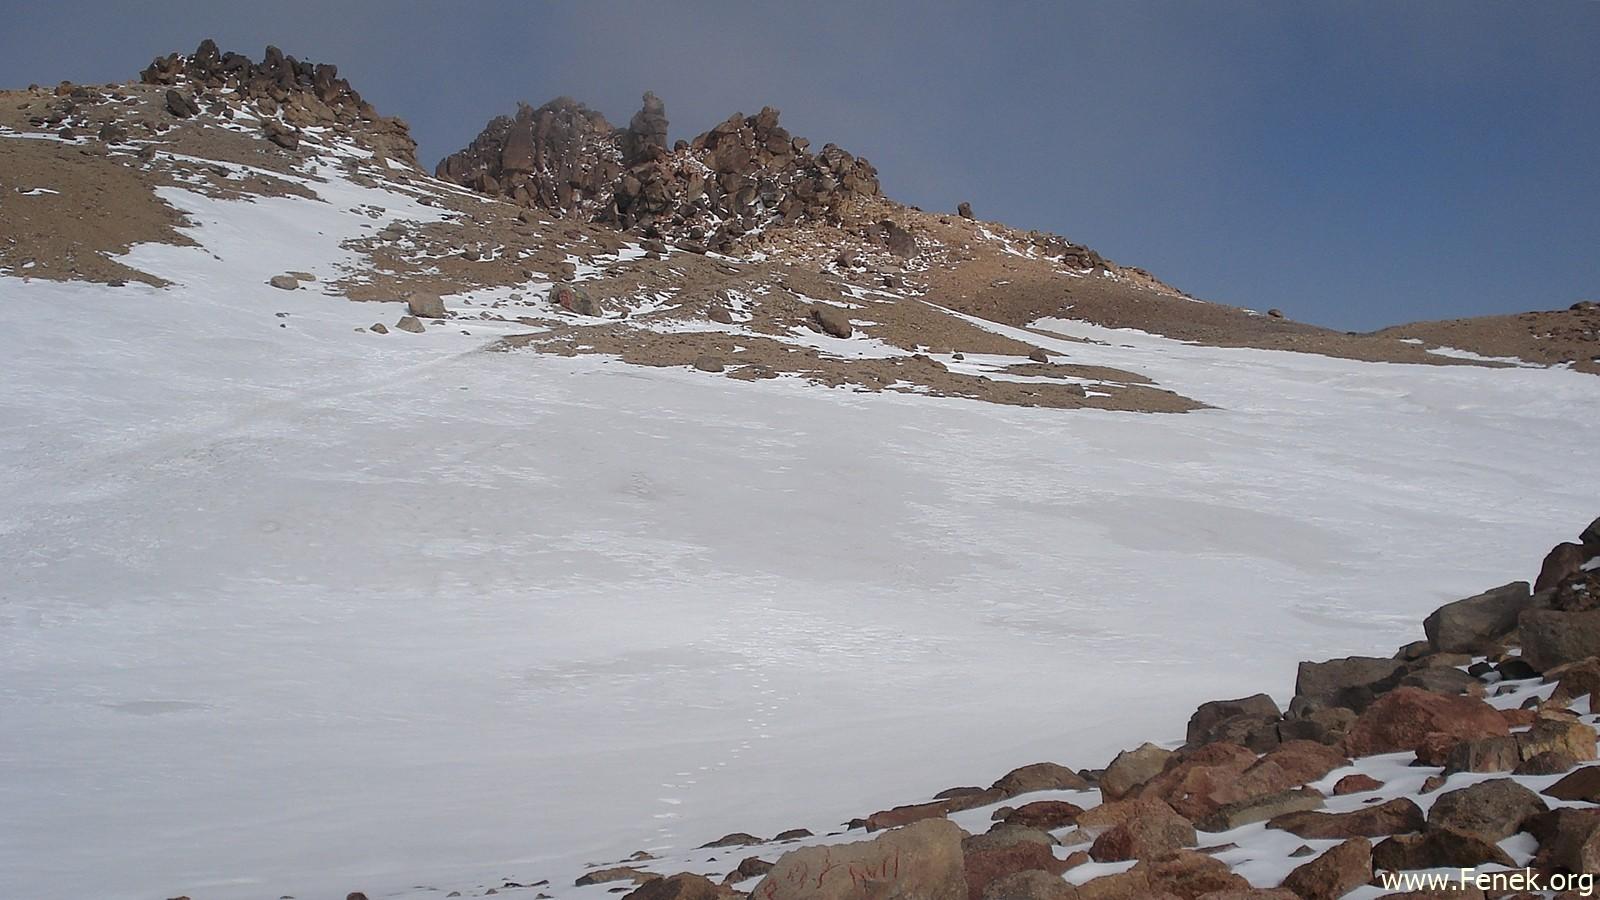 Schneefeld unterhalb des Gipfels